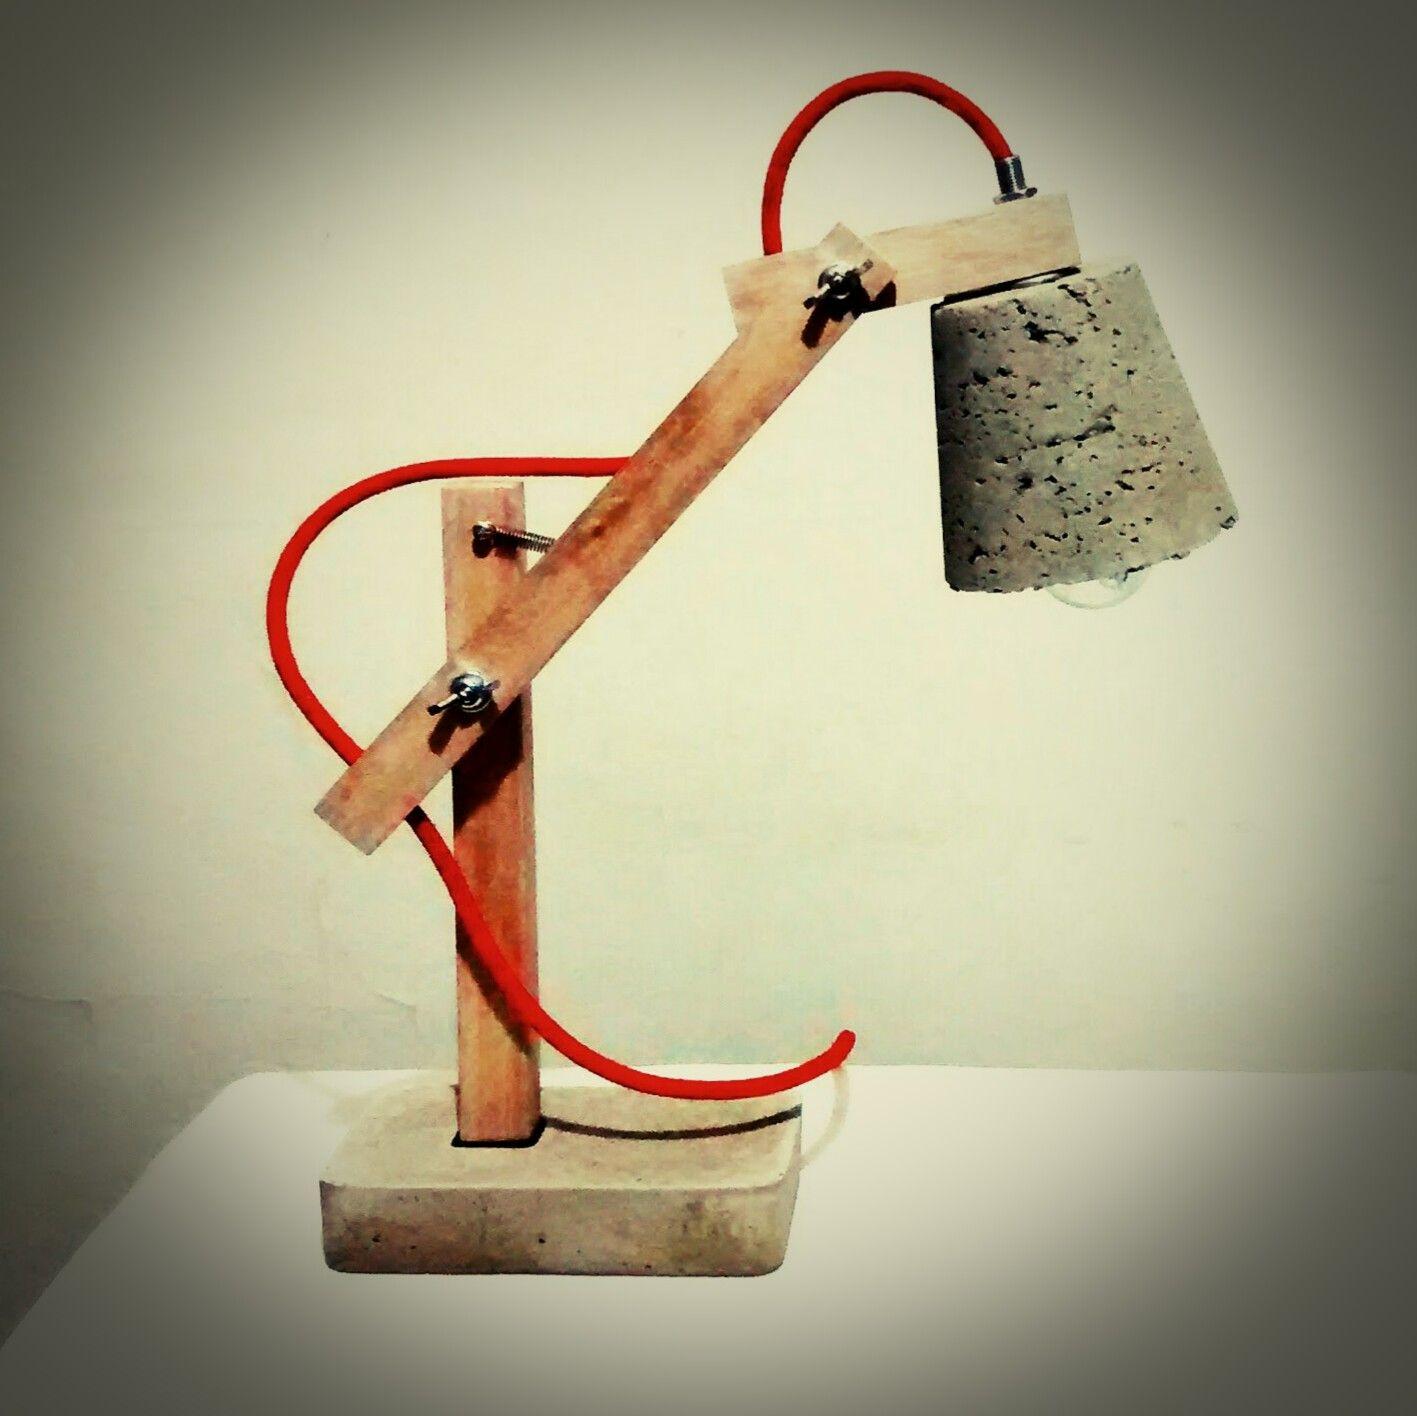 Lampara De Escritorio Con Brazo Regulable En Madera Base De  # Muebles Cemento Liviano